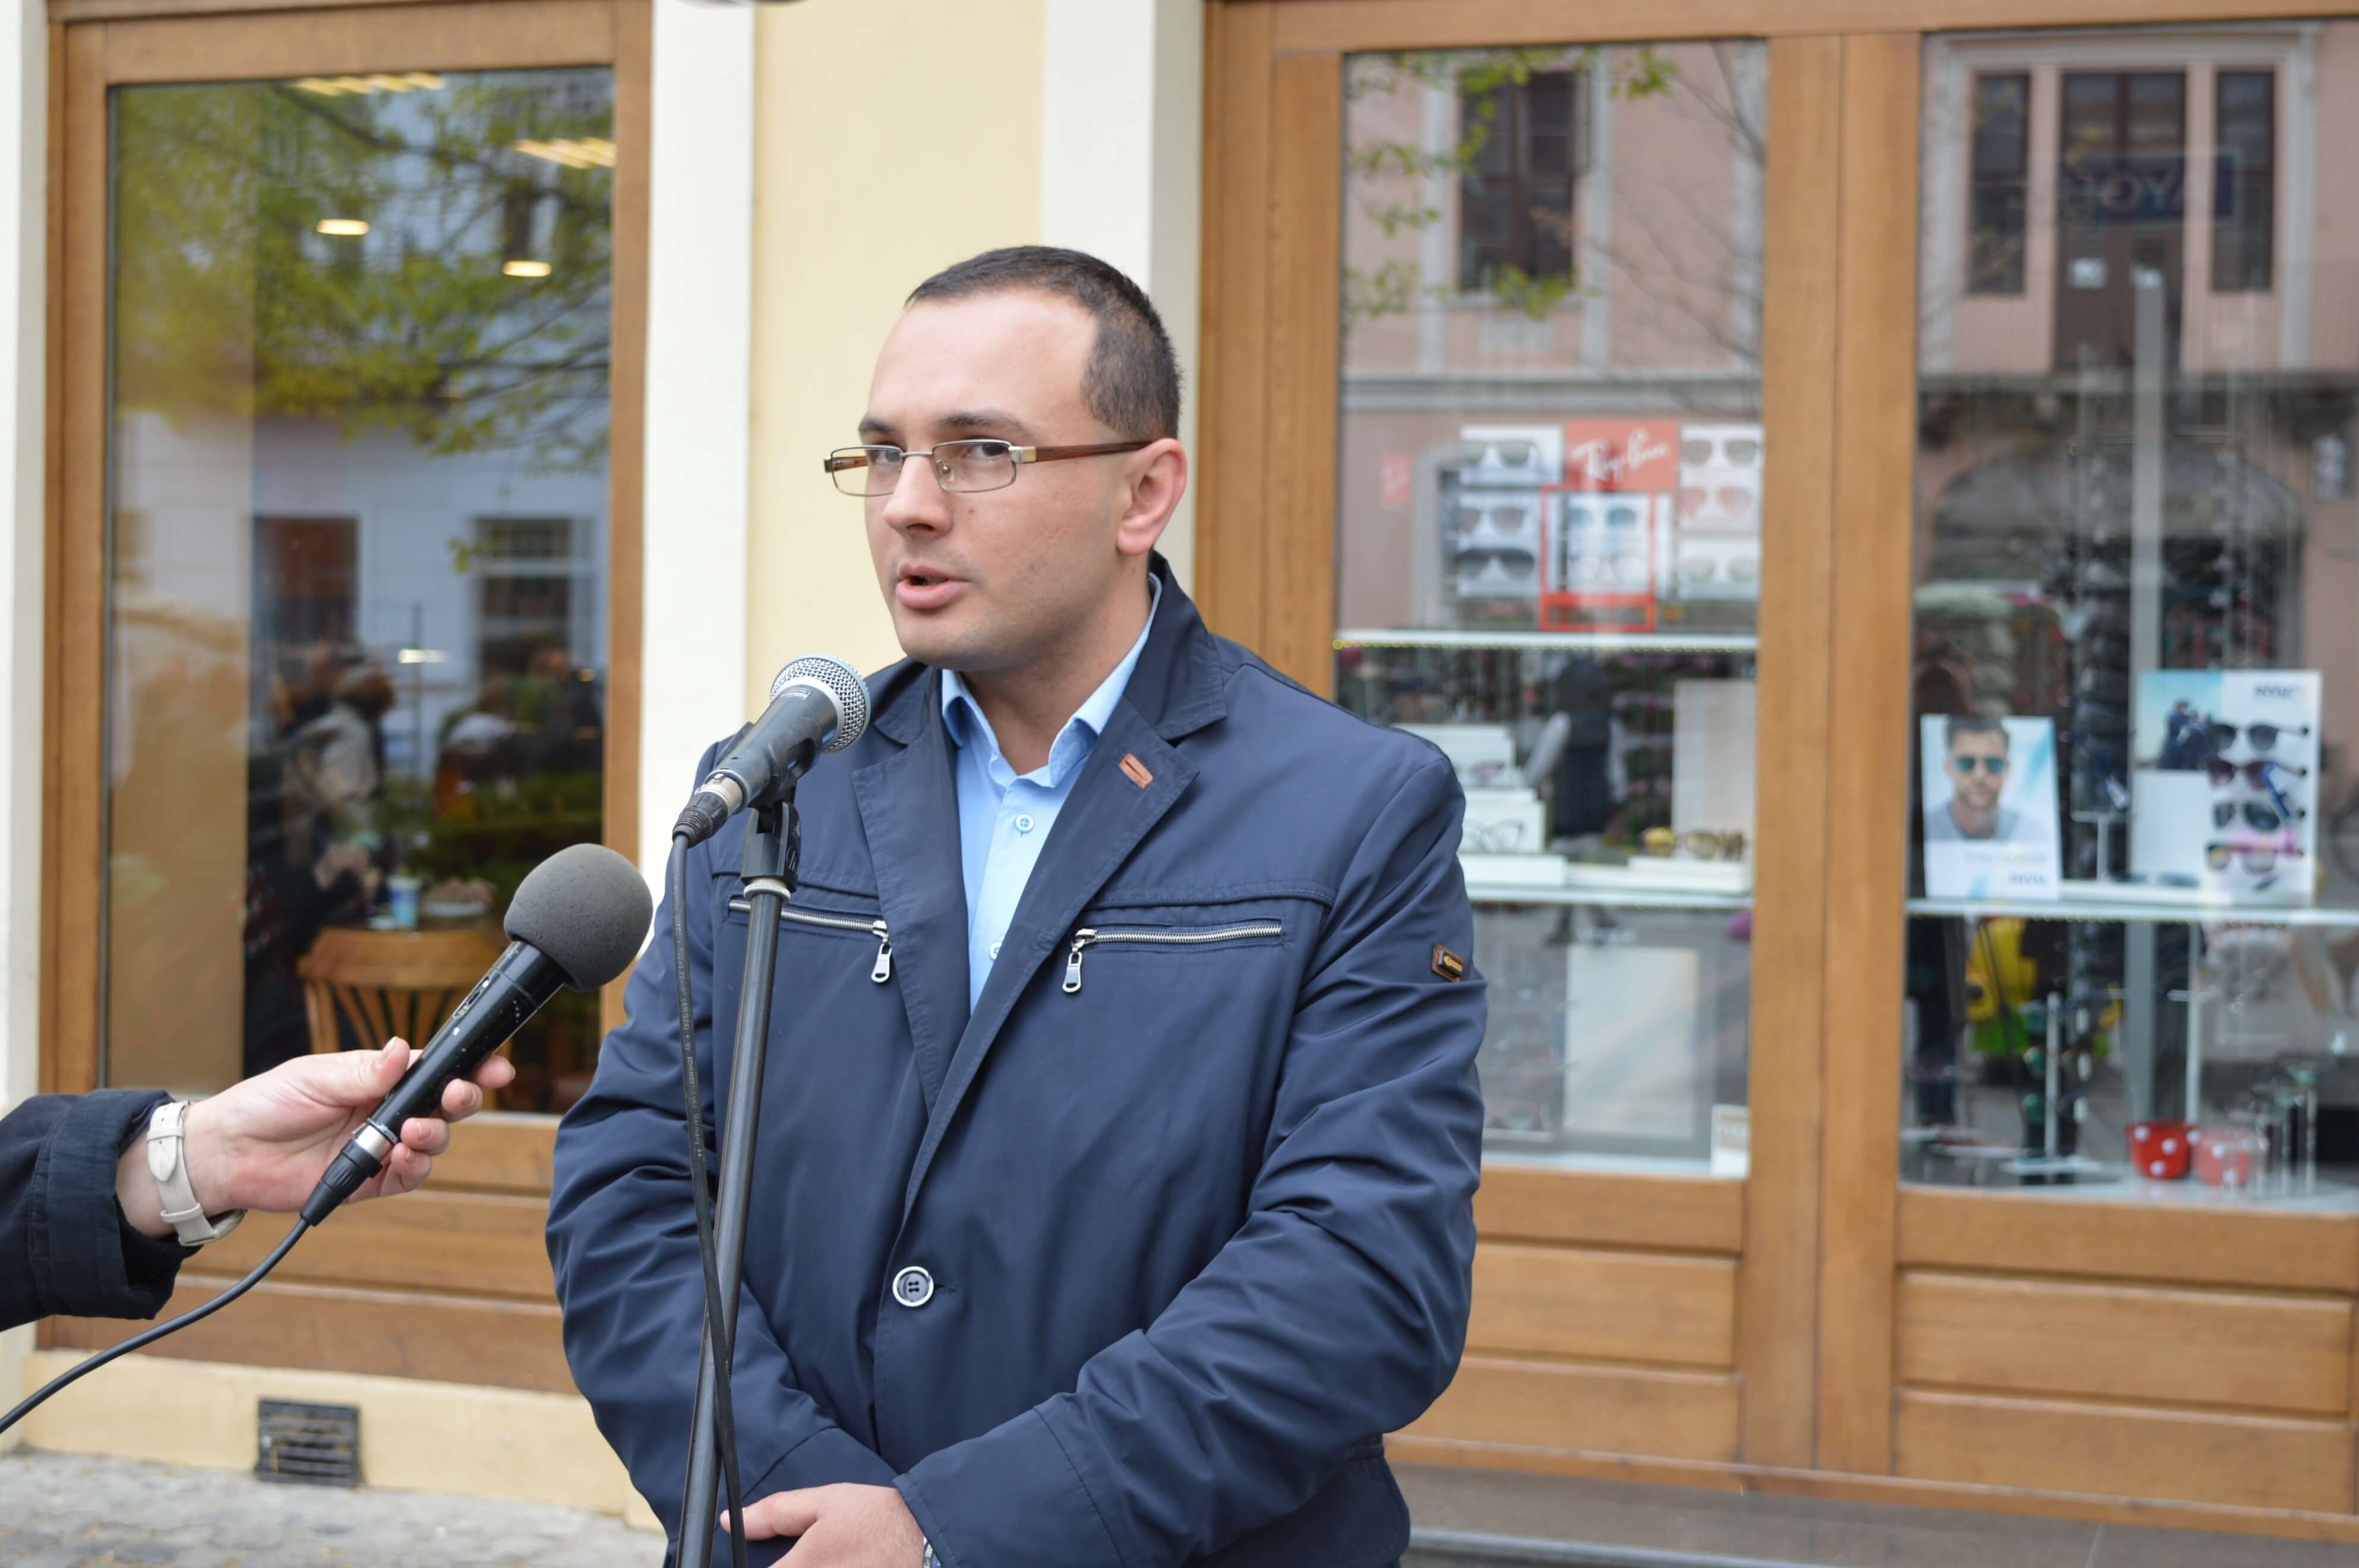 XI Međunarodni festival cveća otvorio Ivan Šimunov pomoćnik gradonačelnice